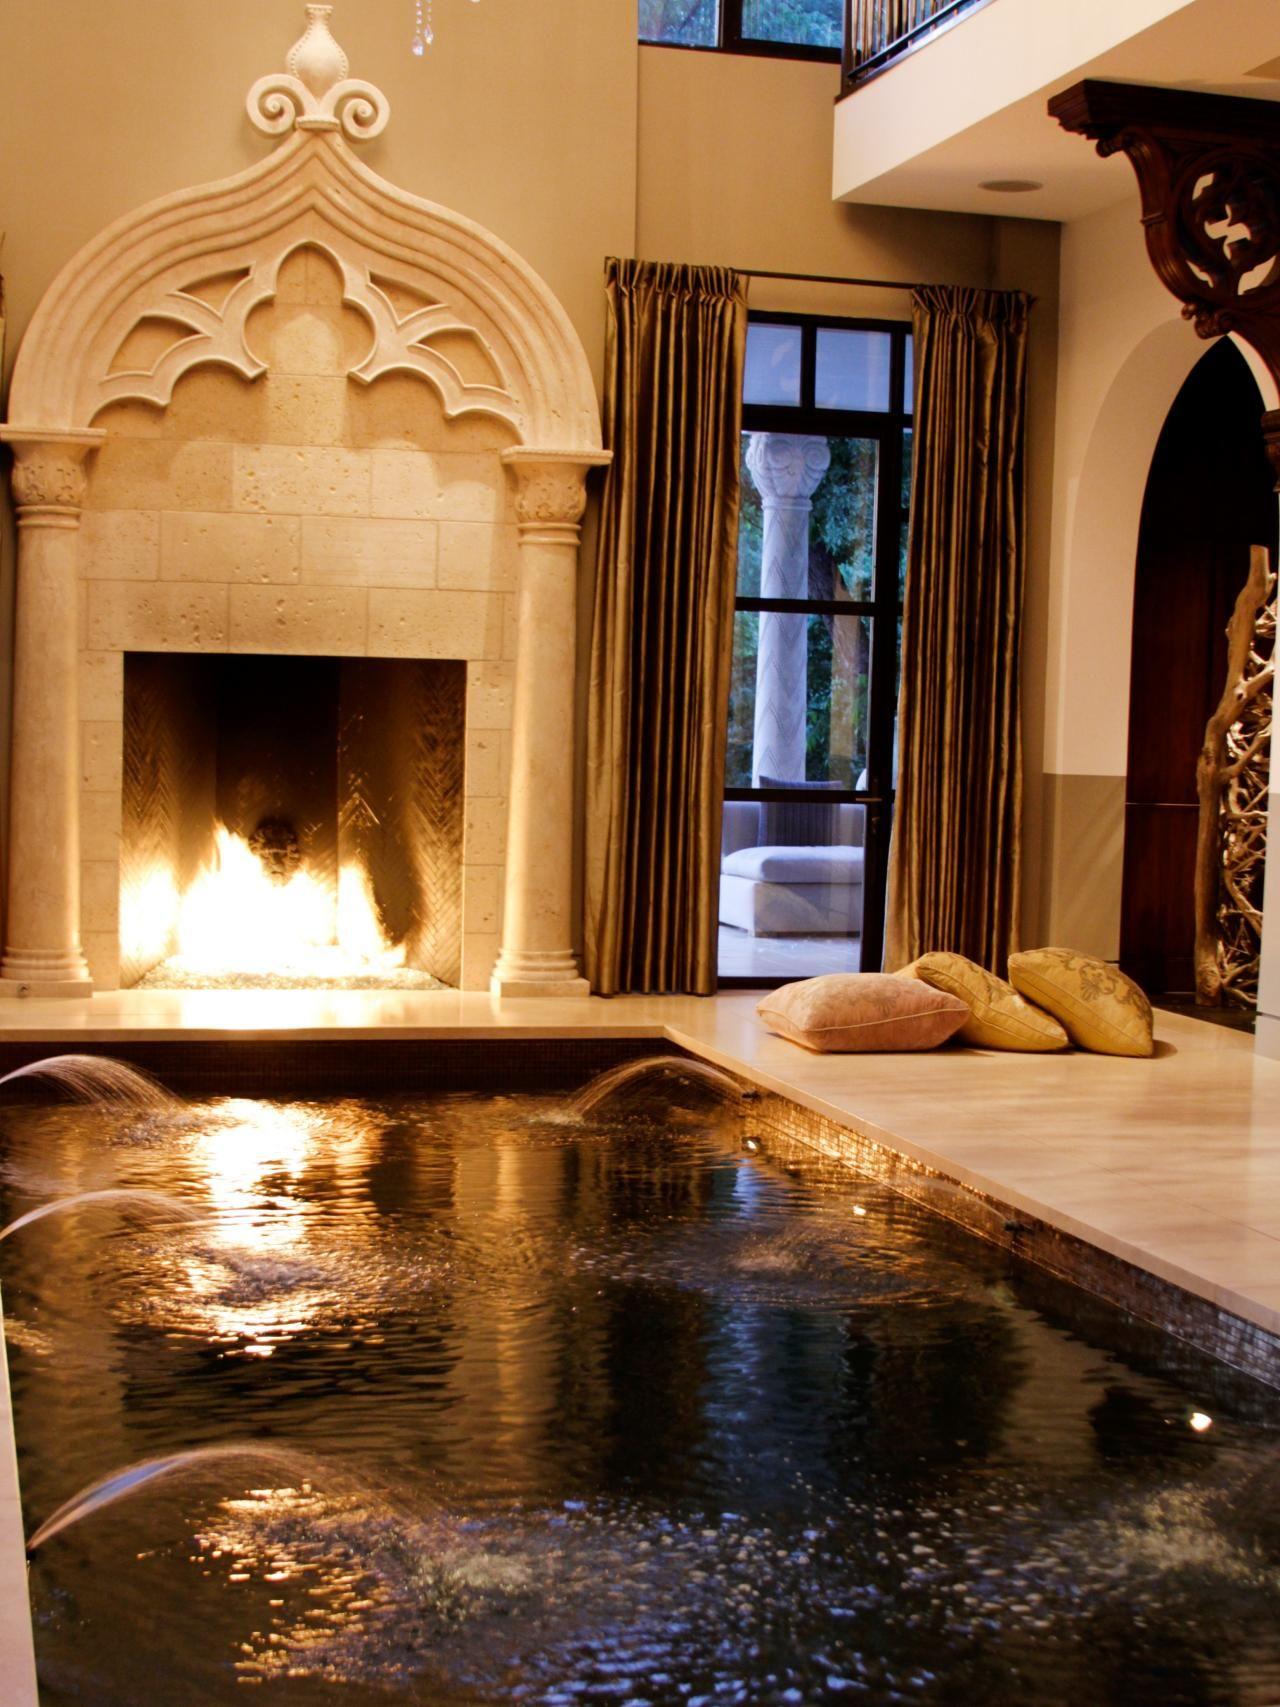 Indoor Spa With Ornate Fireplace Indoor Spa Spa Pool Indoor Pool